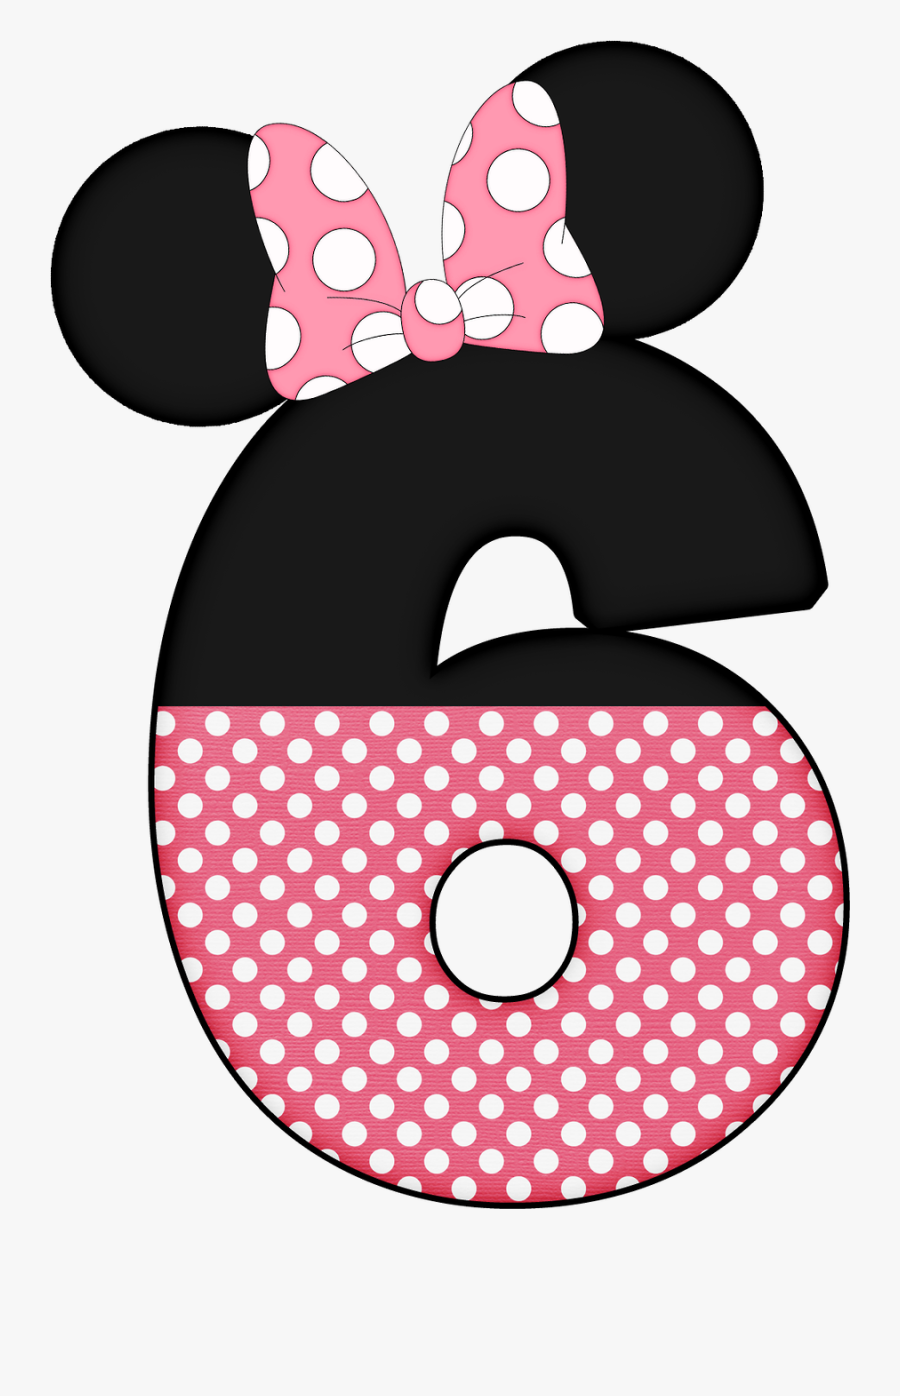 Mickey E Minnie, Transparent Clipart